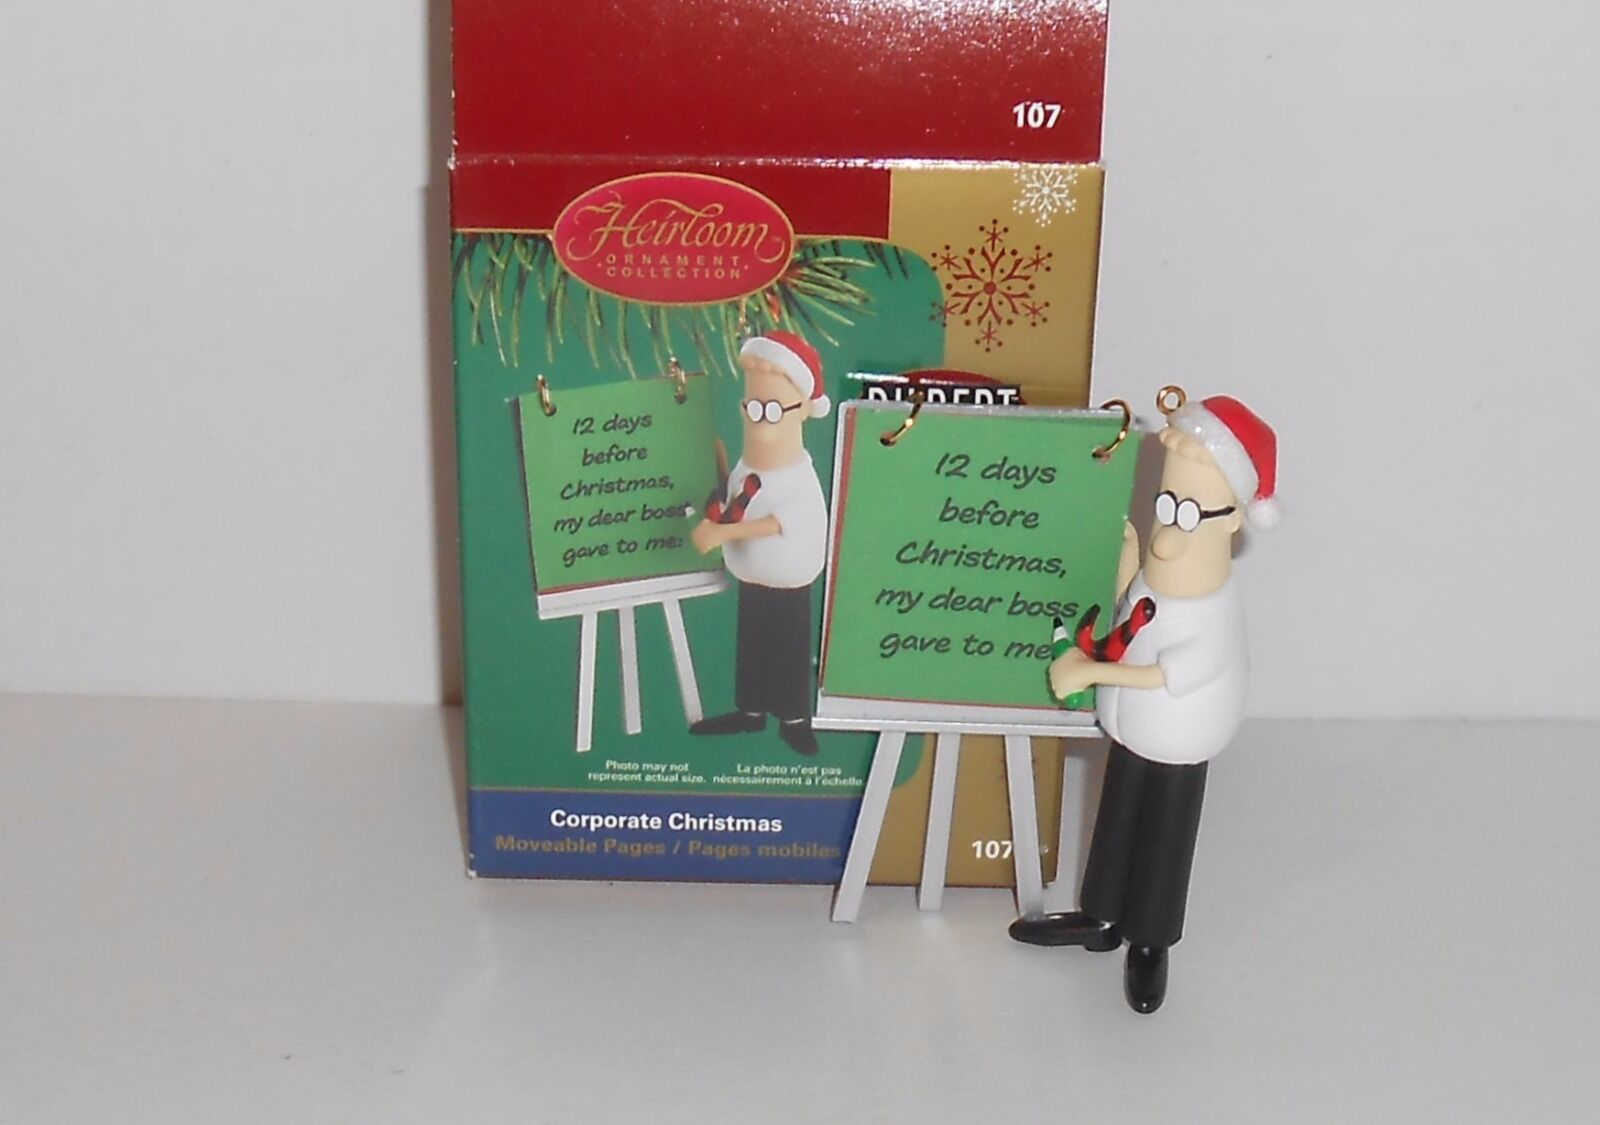 New Heirloom Dilbert Corporate Christmas Ornament